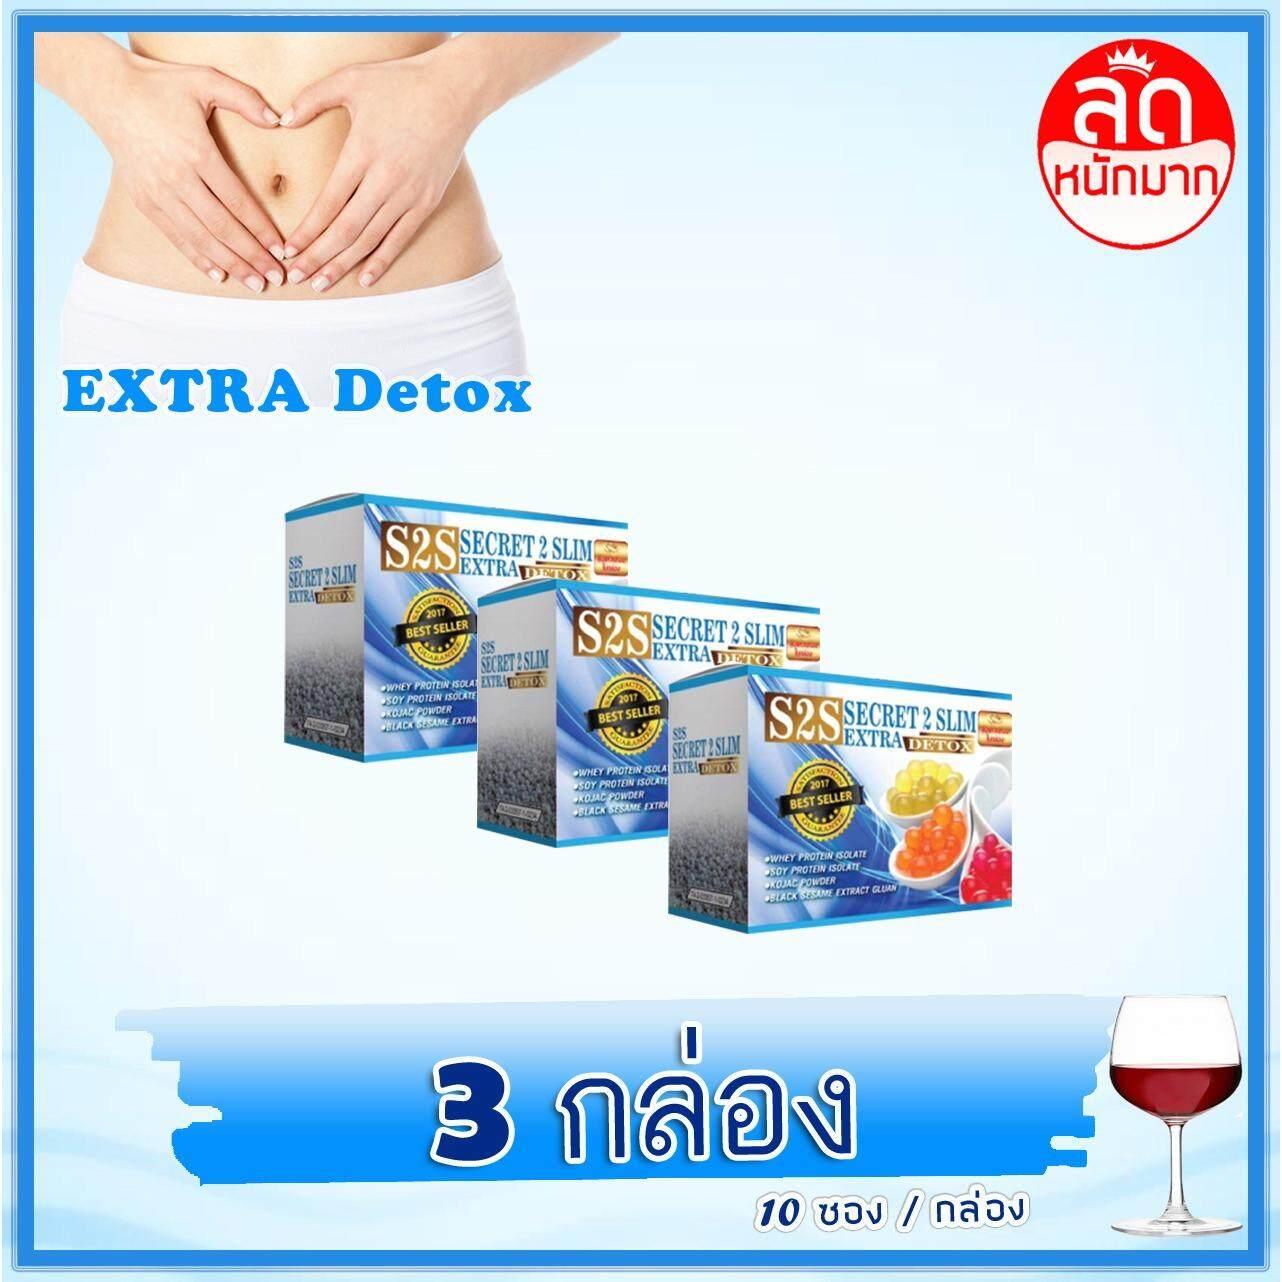 S2S Secret 2 Slim Extra Detox เอส2เอส ดีท็อกซ์สูตรWhey Protein ผอมไม่ย้วย ผลิตภัณฑ์น้ำชงลดน้ำหนัก 3 กล่อง 10 ซอง กล่อง ใน กรุงเทพมหานคร